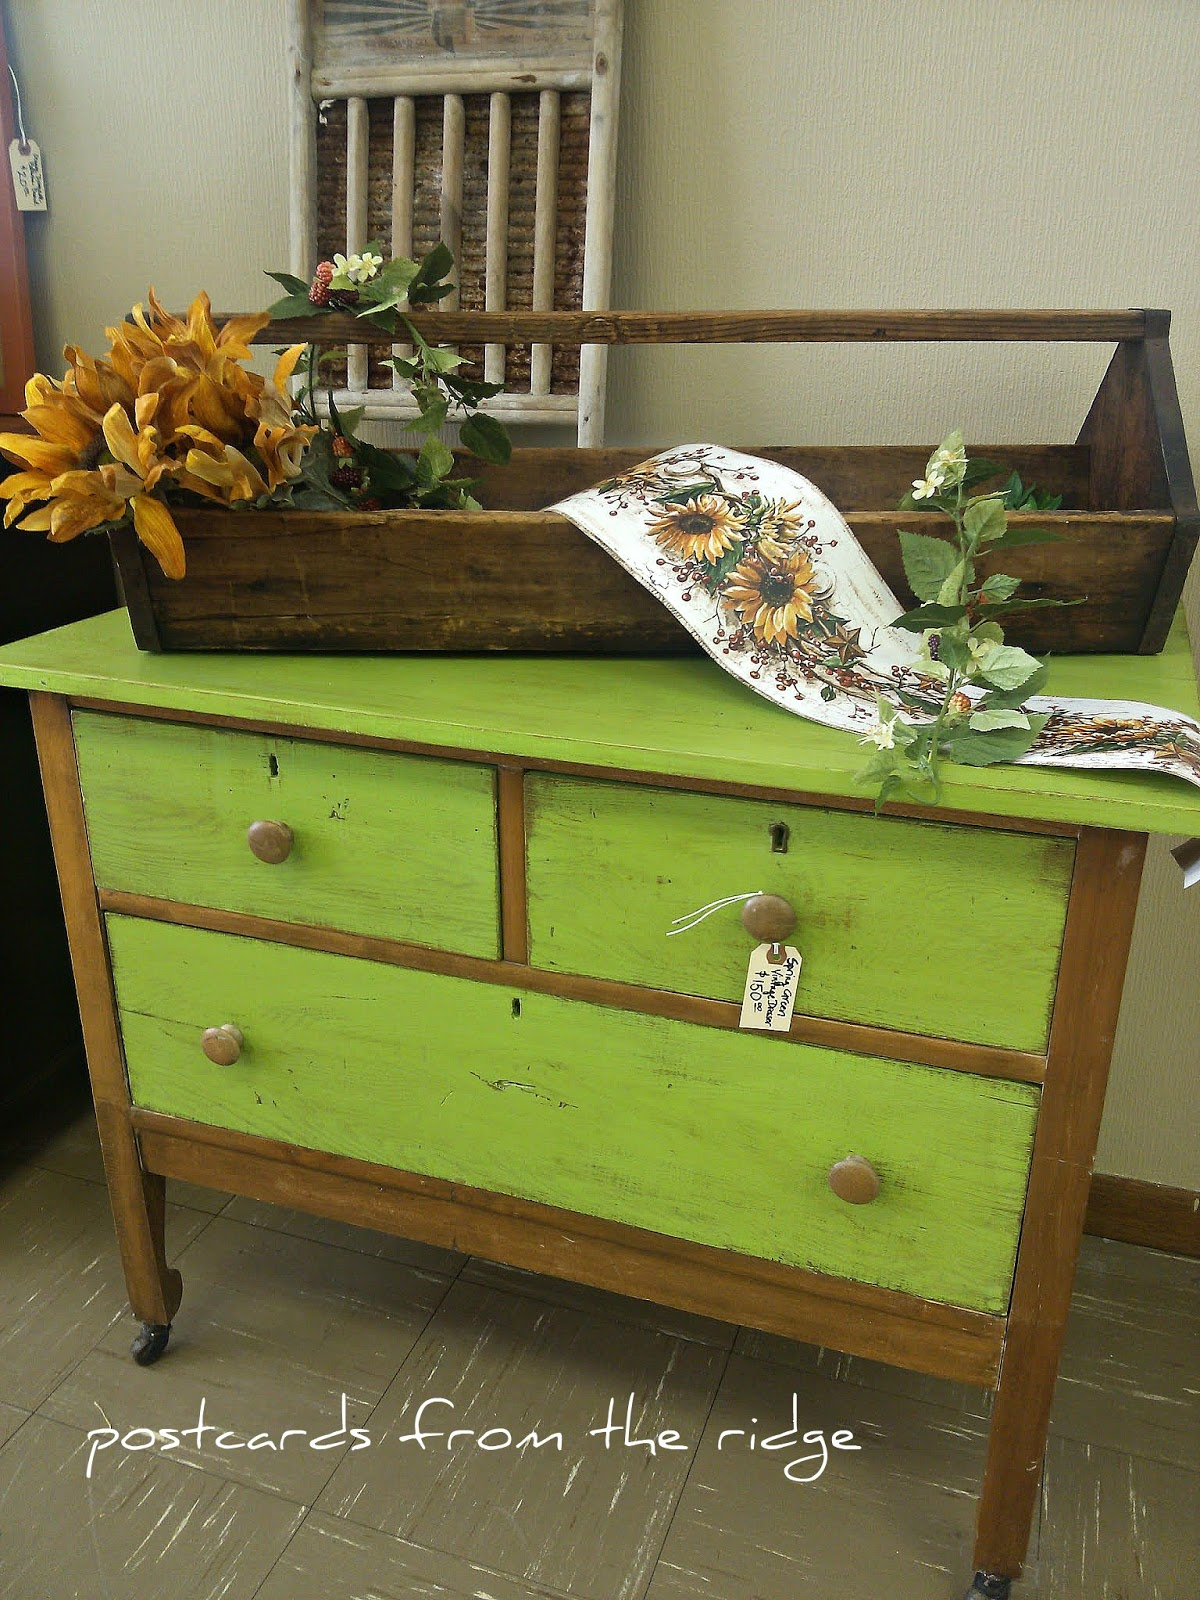 Spring Green Vintage Oak Dresser Postcards From The Ridge